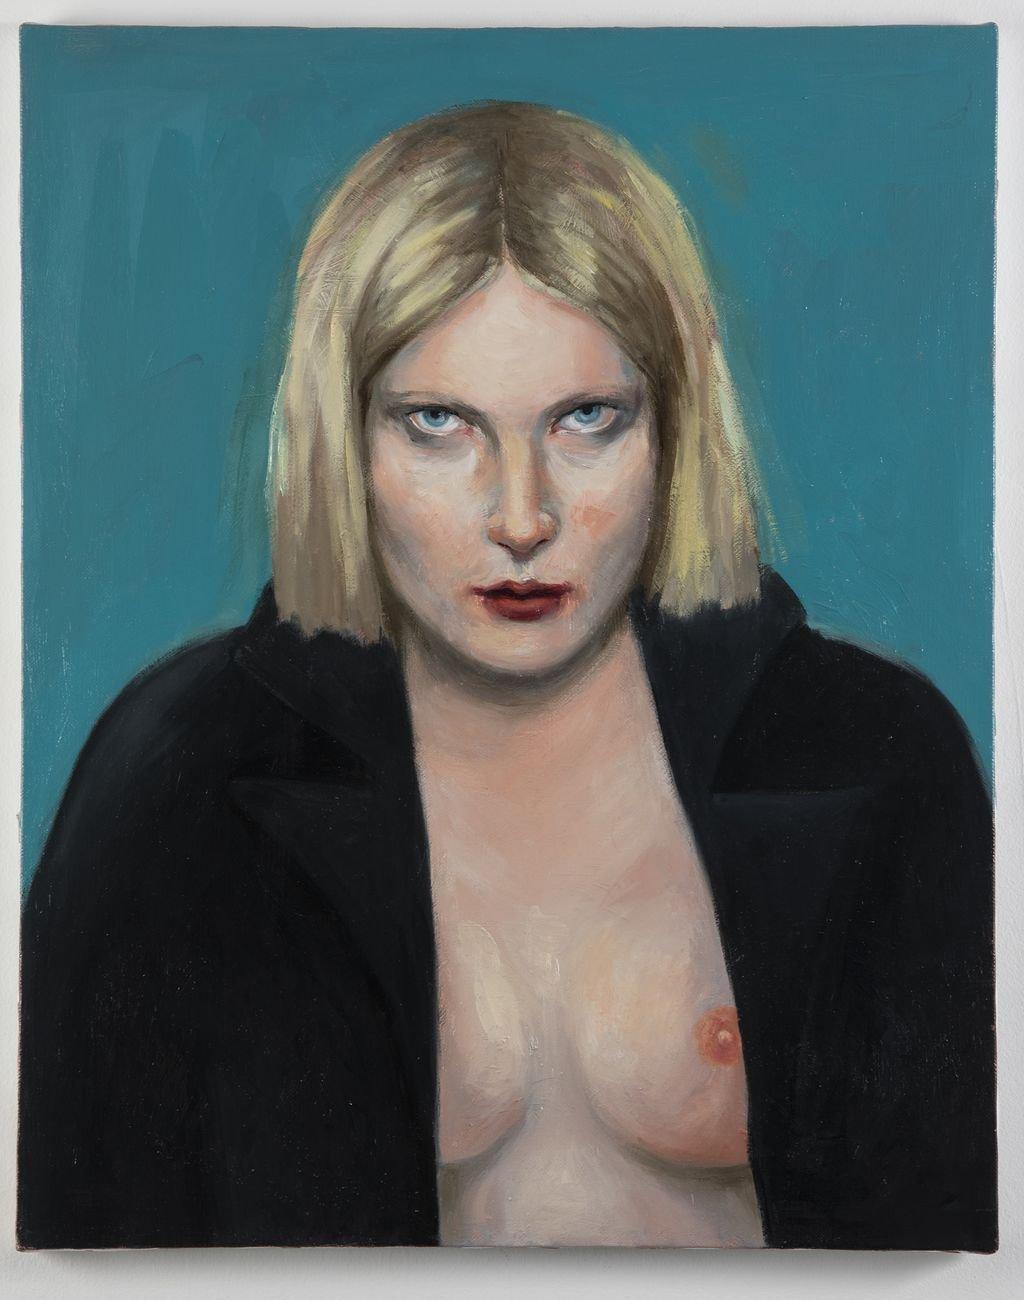 Paola Gandolfi, Sono io che ti guardo, 2020, olio su tela, 50x40 cm